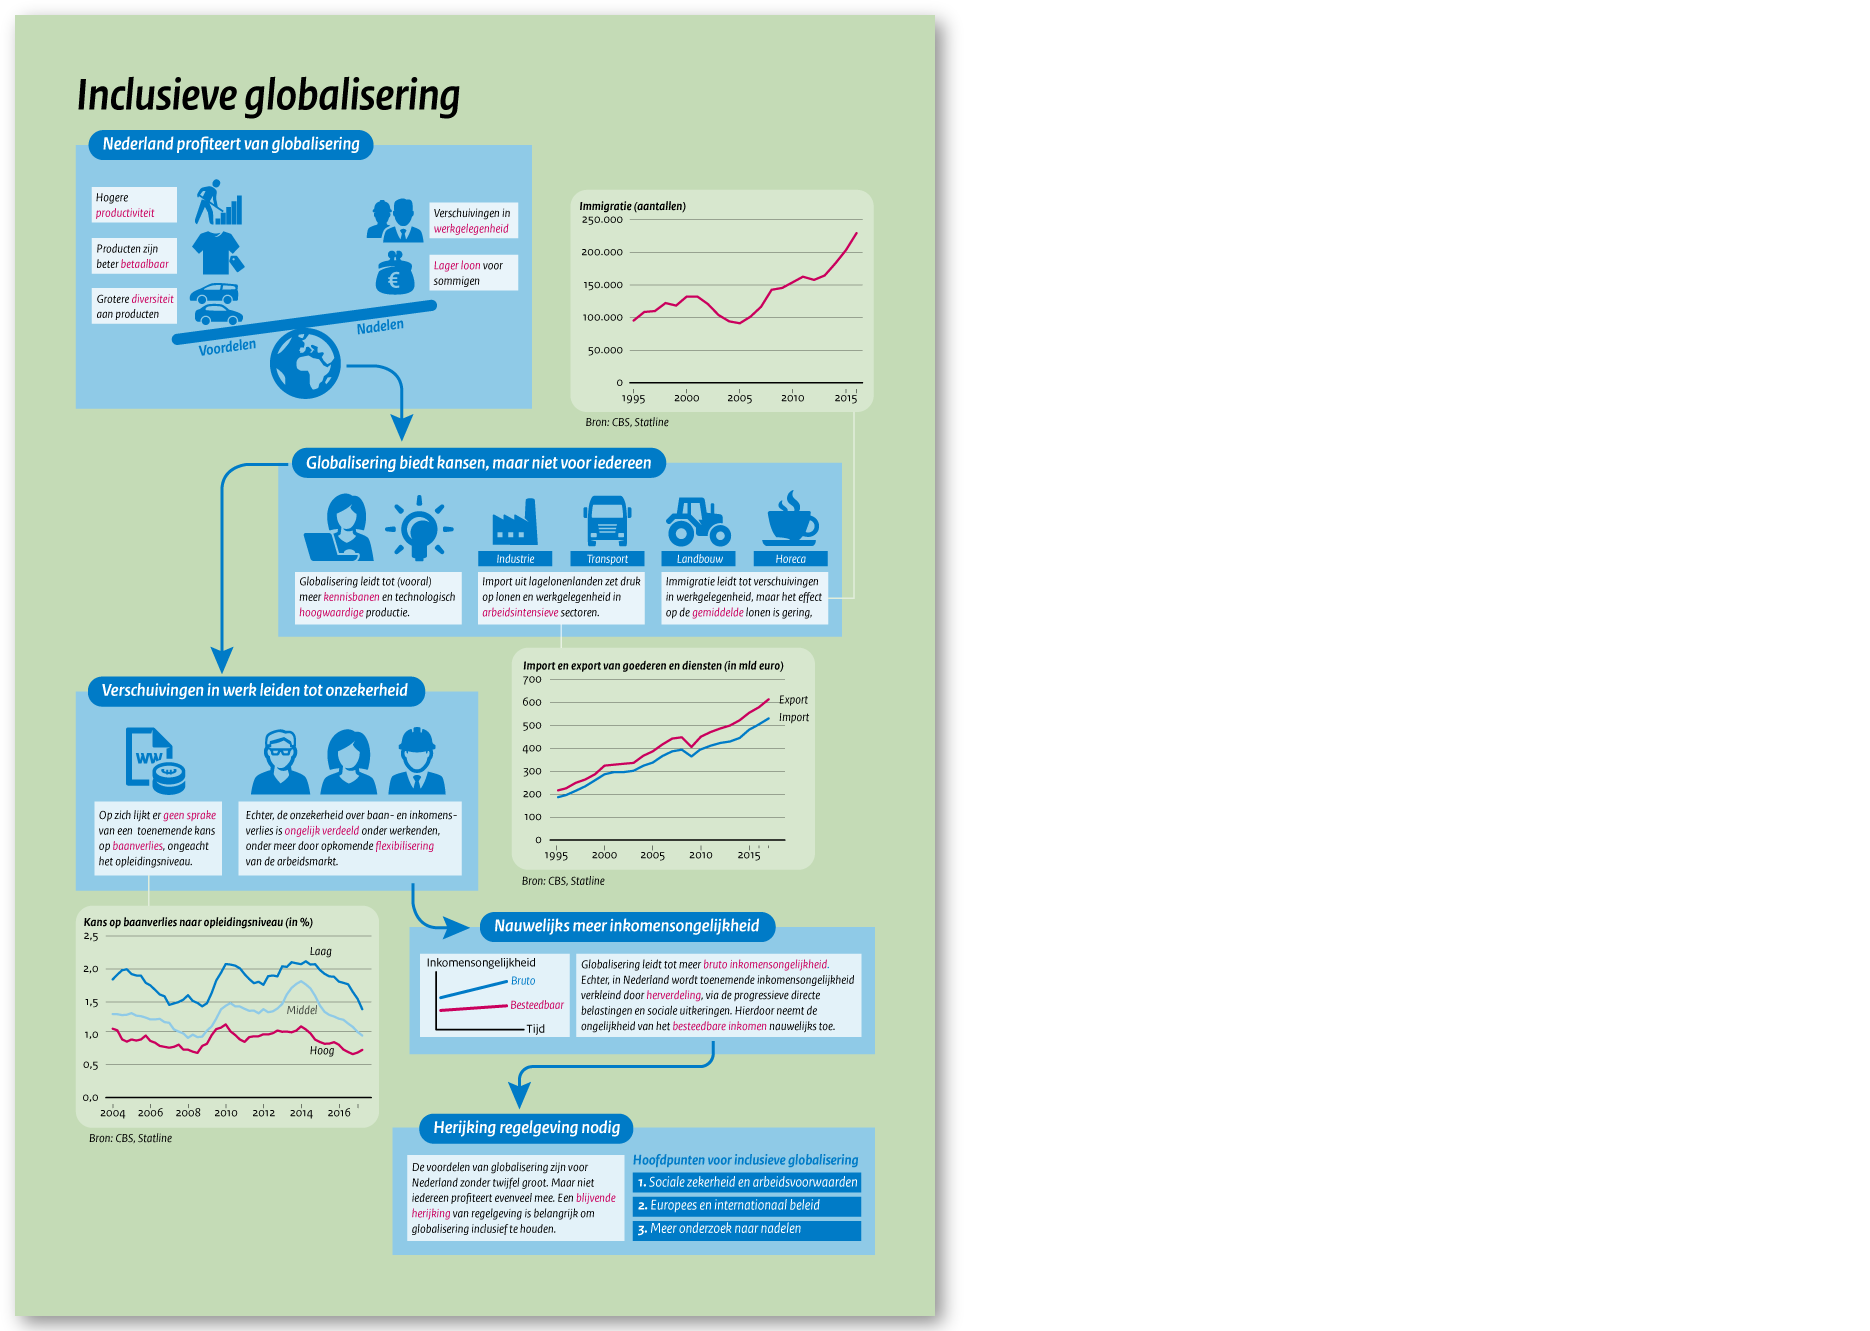 Inclusieve globalisering (Centraal Planbureau)